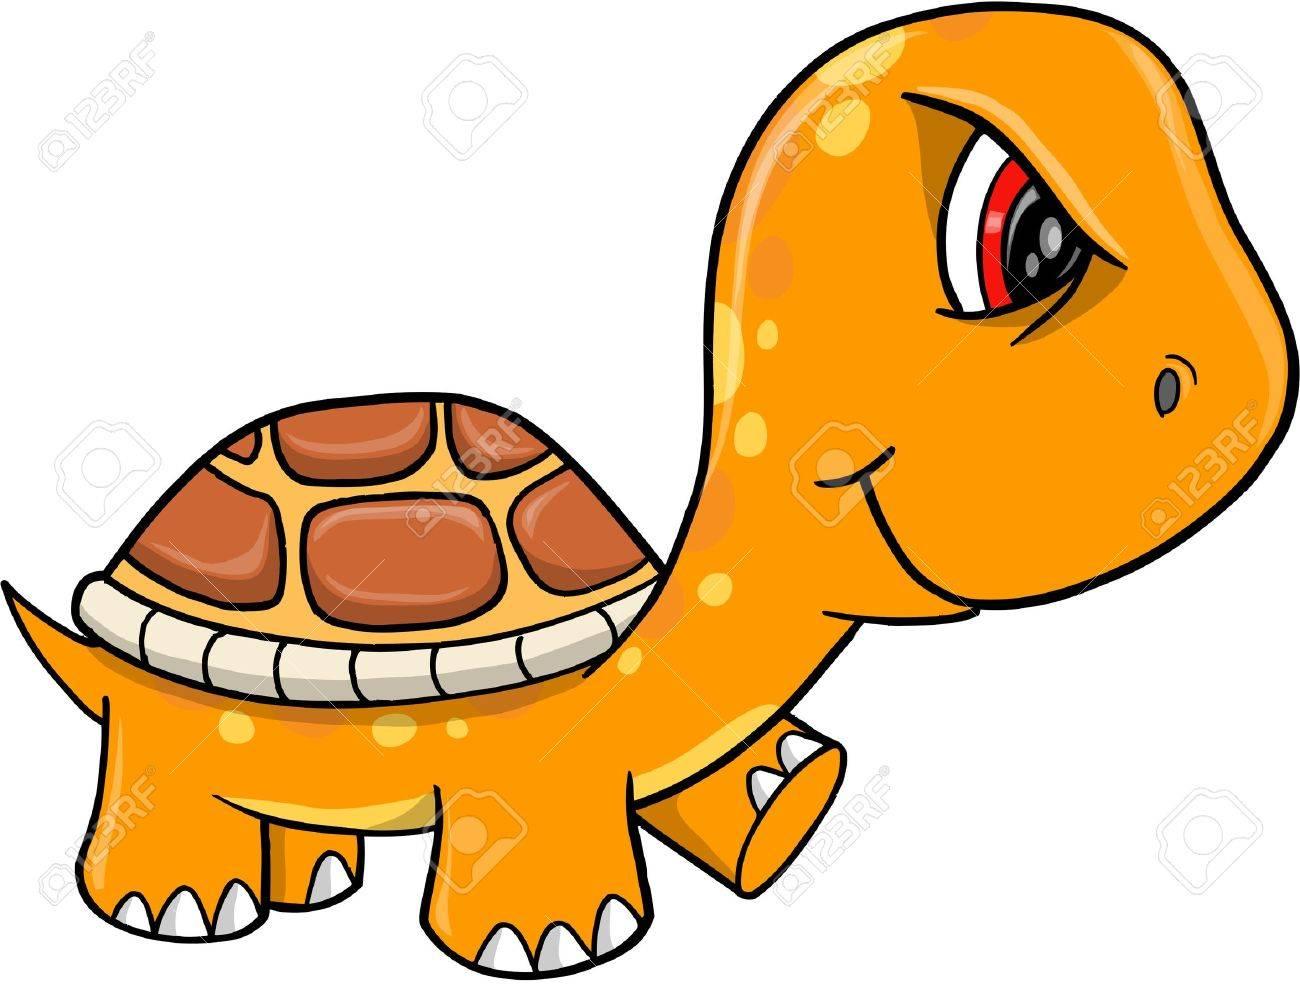 Angry Mad Orange Turtle Vector Illustration Art - 12151194